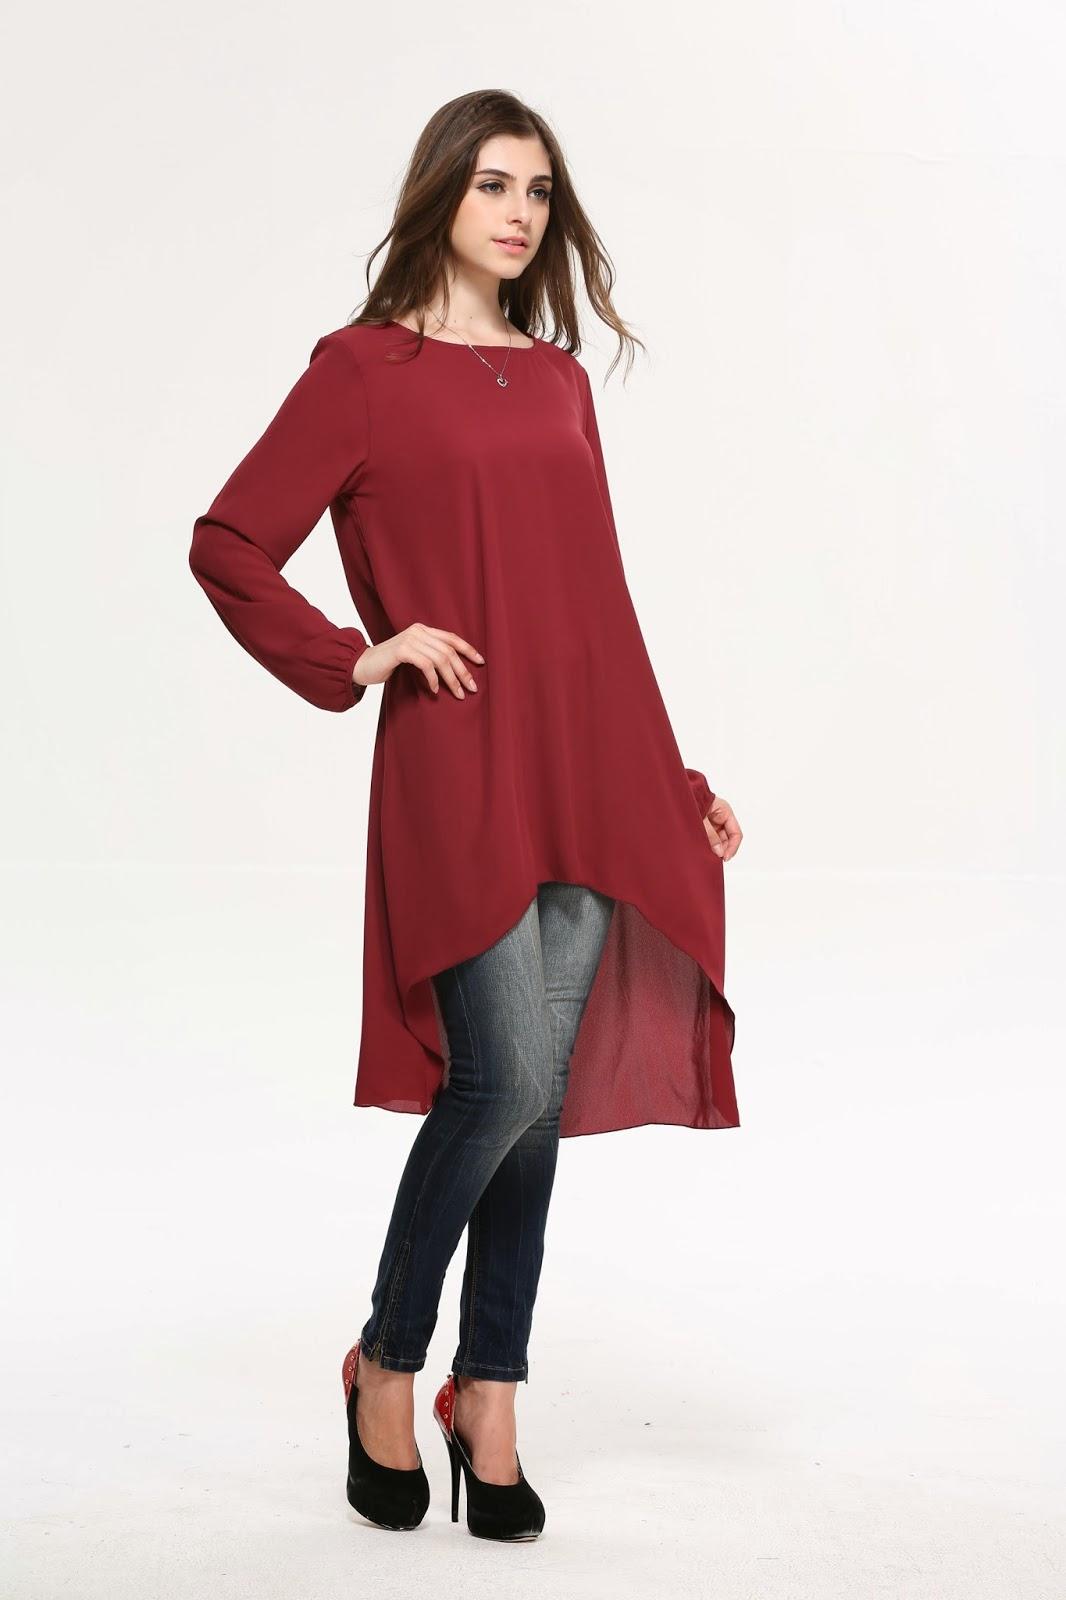 Infojelita Fesyen Blouse Terkini Korea Labuh FOR SALE